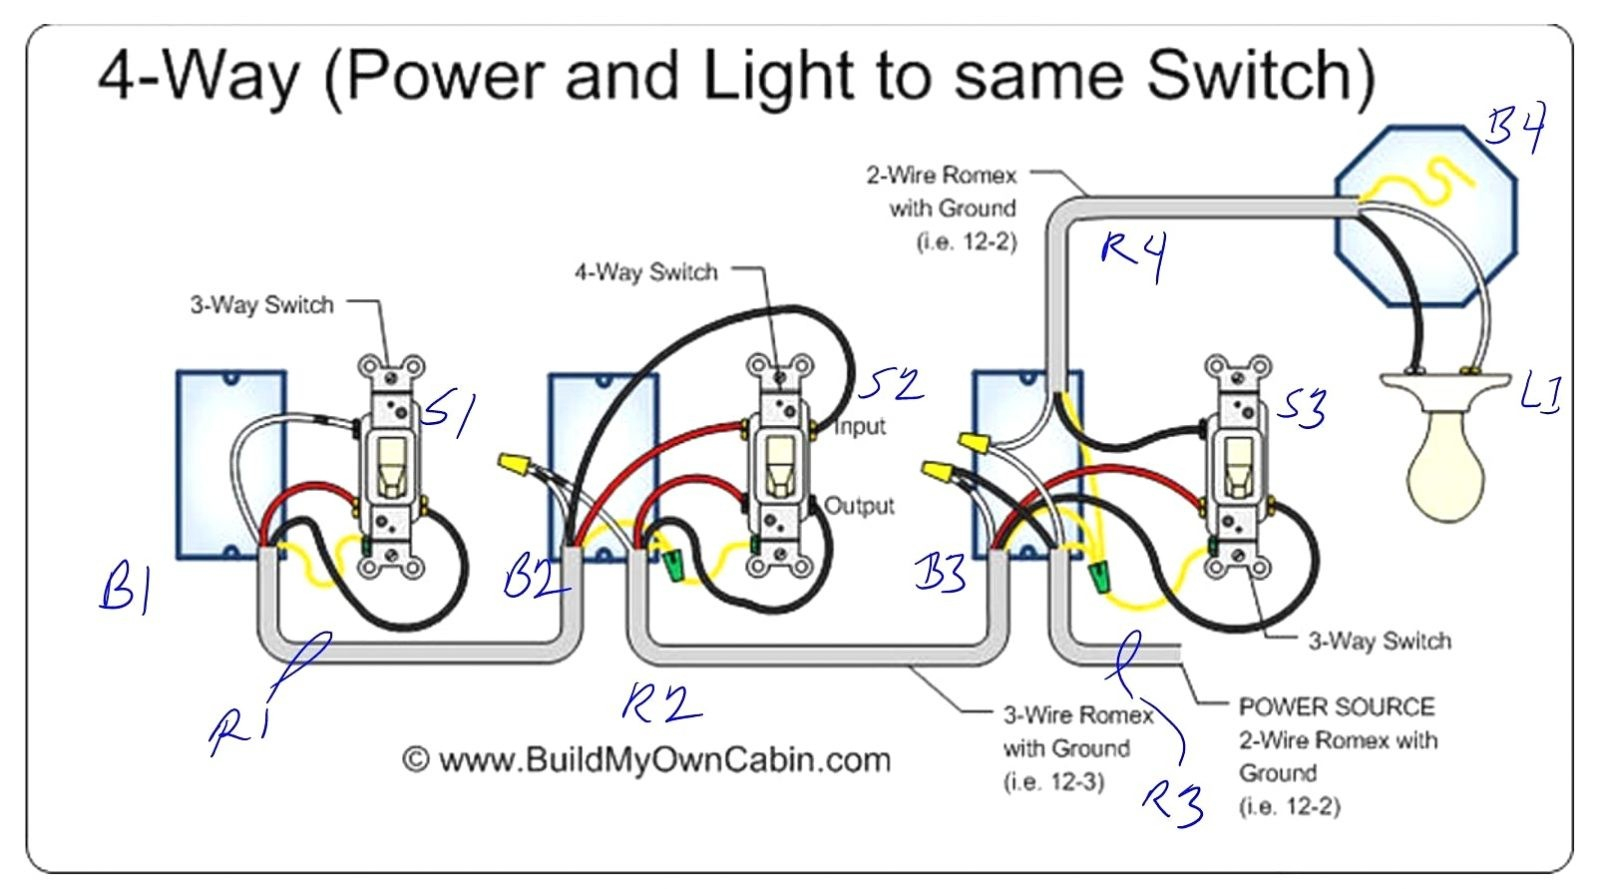 Lutron Caseta Wiring Diagrams | Wiring Diagram - Lutron 3 Way Dimmer Switch Wiring Diagram